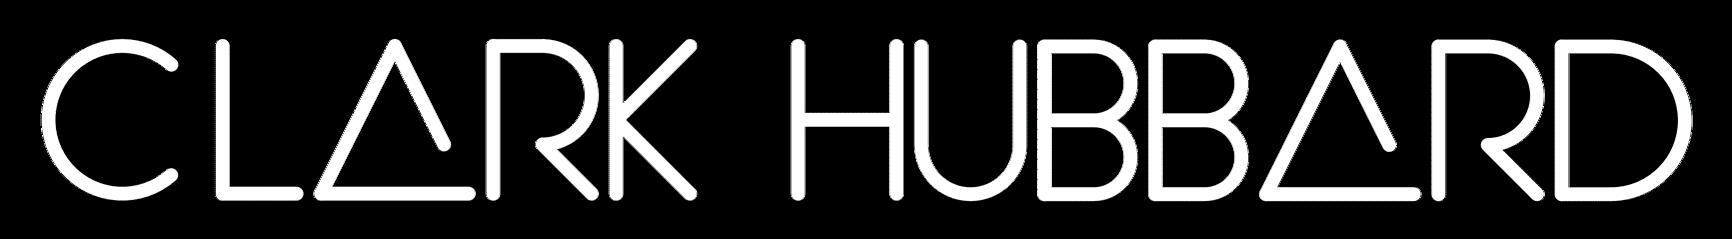 Clark Hubbard Logo